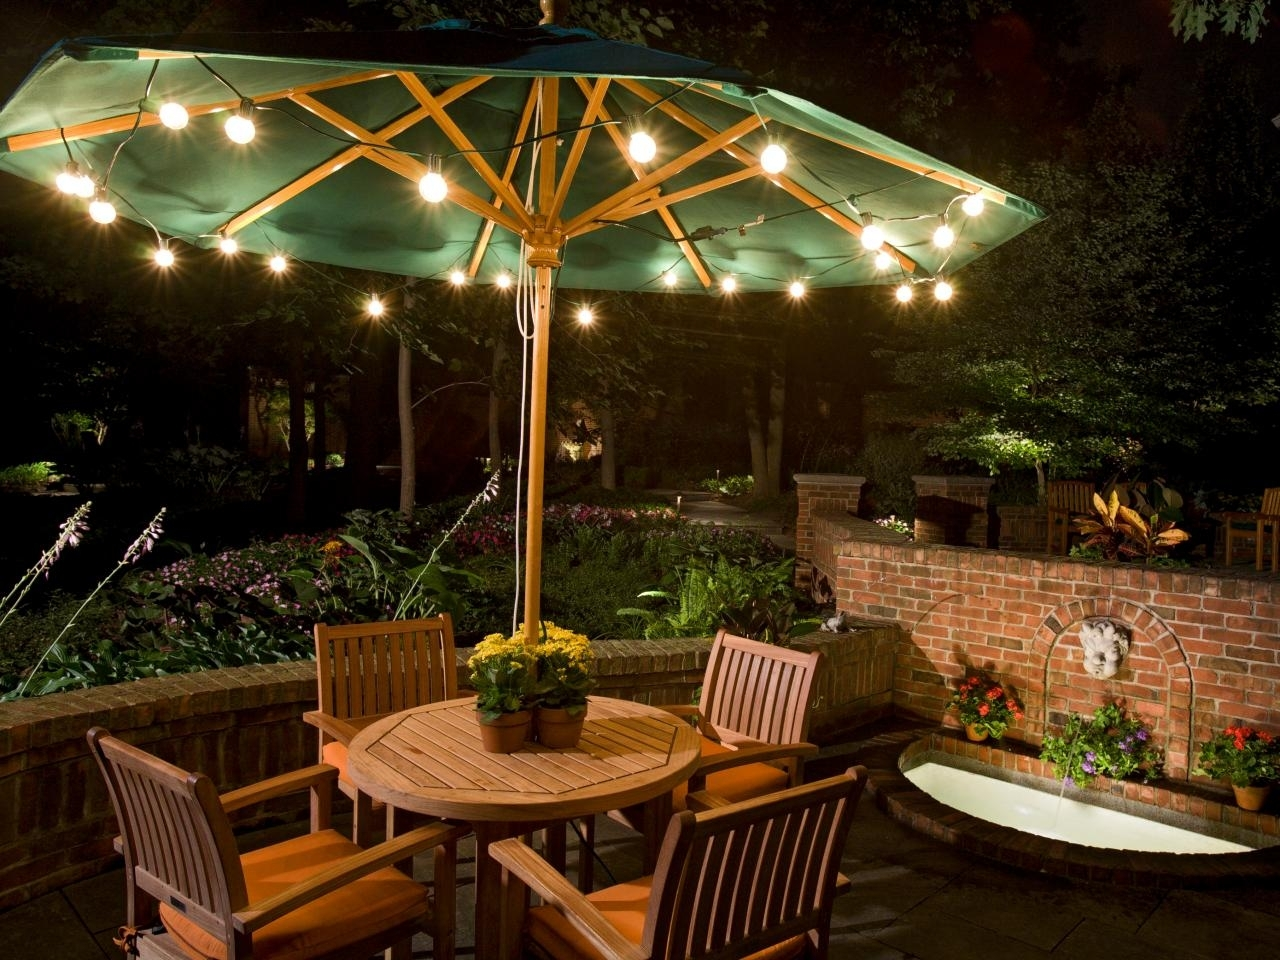 Umbrella Outdoor Landscape Lighting : Latest Trend In Outdoor Within Outdoor Umbrella Lanterns (View 18 of 20)